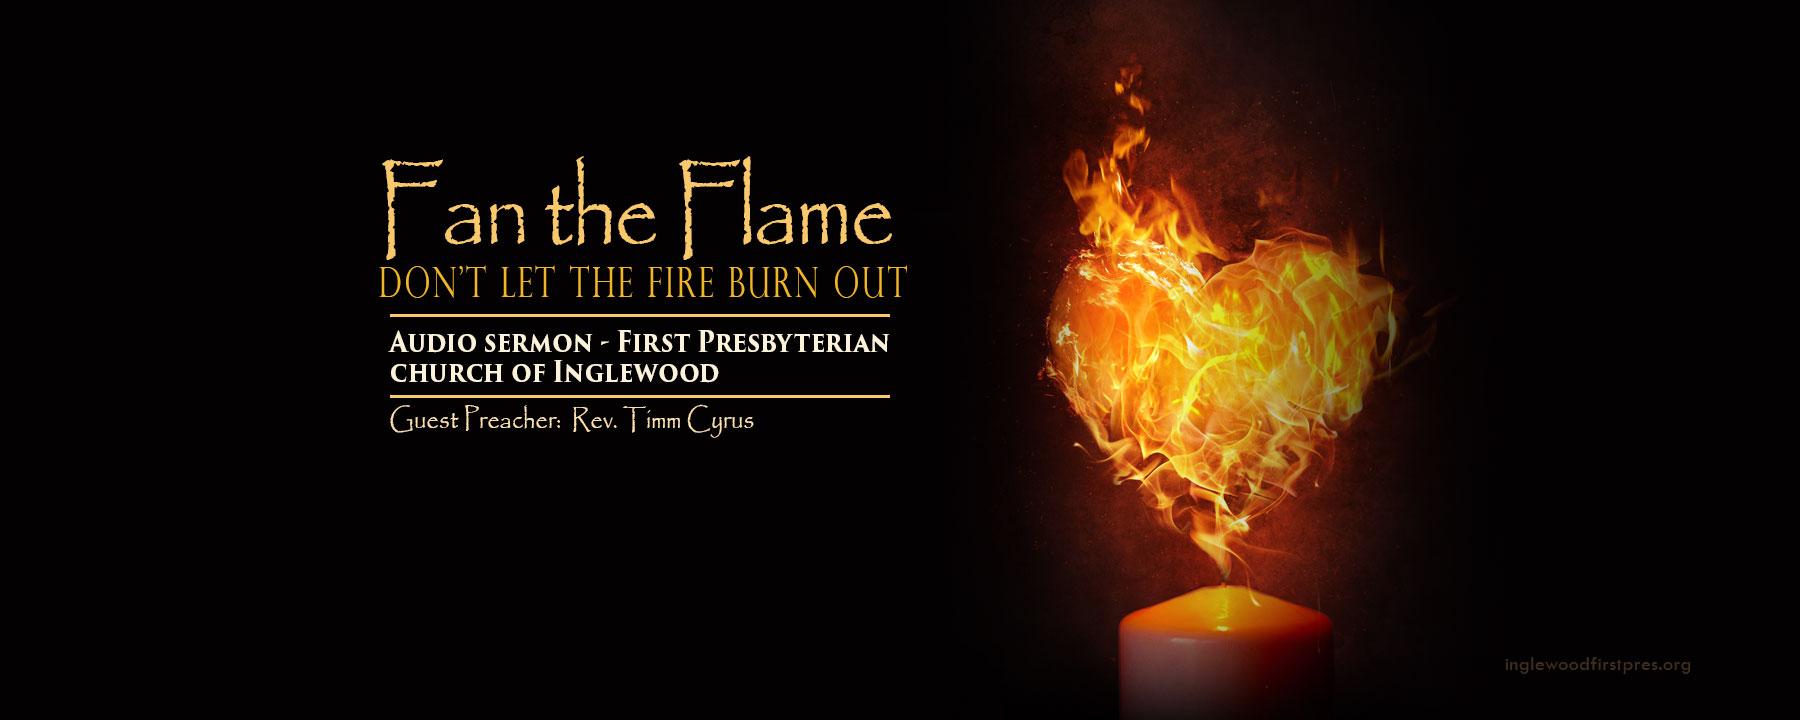 Audio Sermon: Fan the Flame by guest preacher Rev. Timm Cyrus